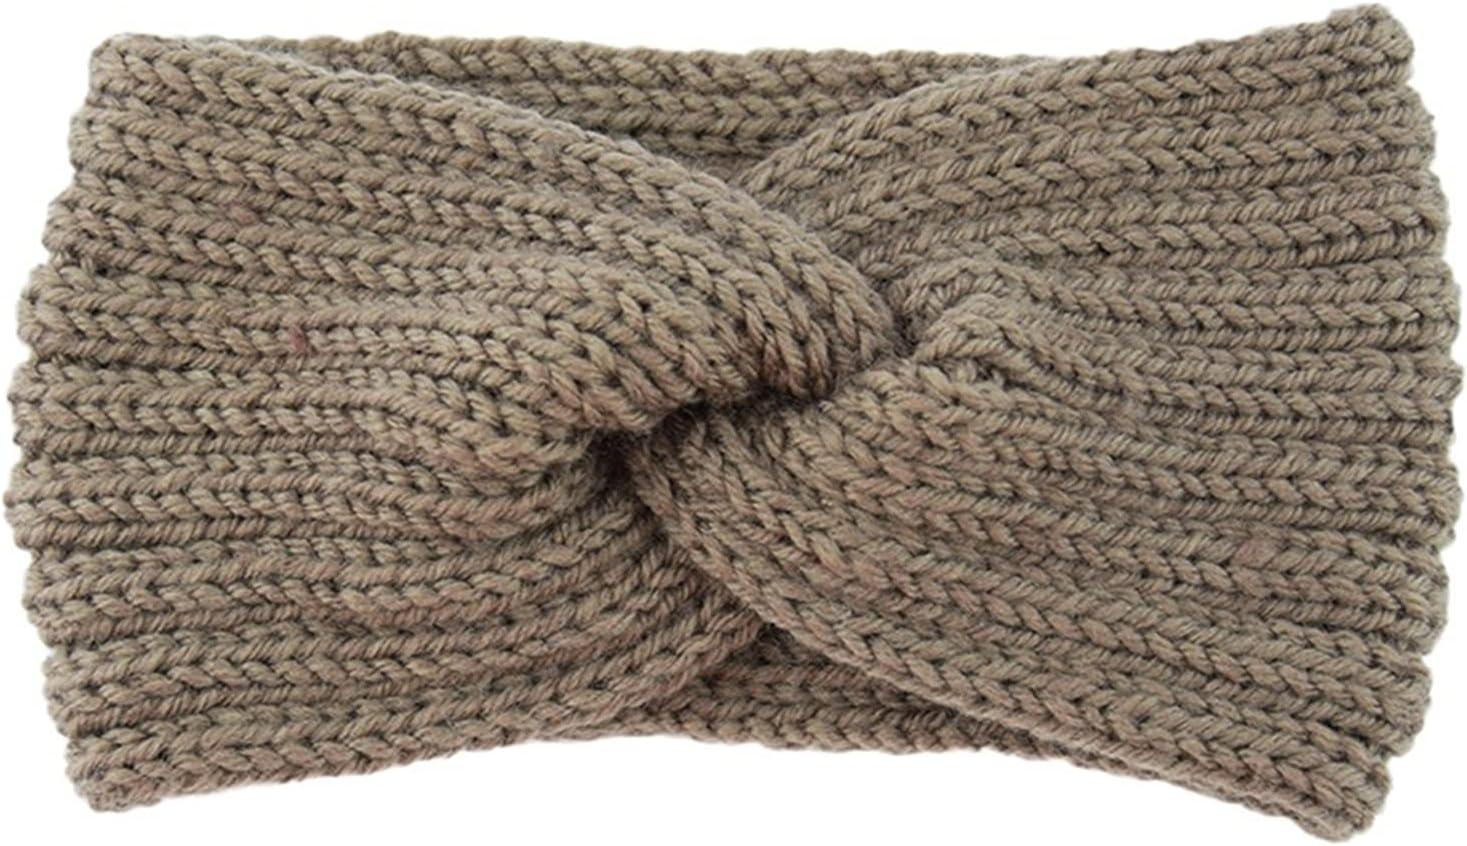 GTSIQJN Spring Free shipping anywhere in the nation Warm Headband Woolen Headbands Wool Knitting Limited price sale Knit